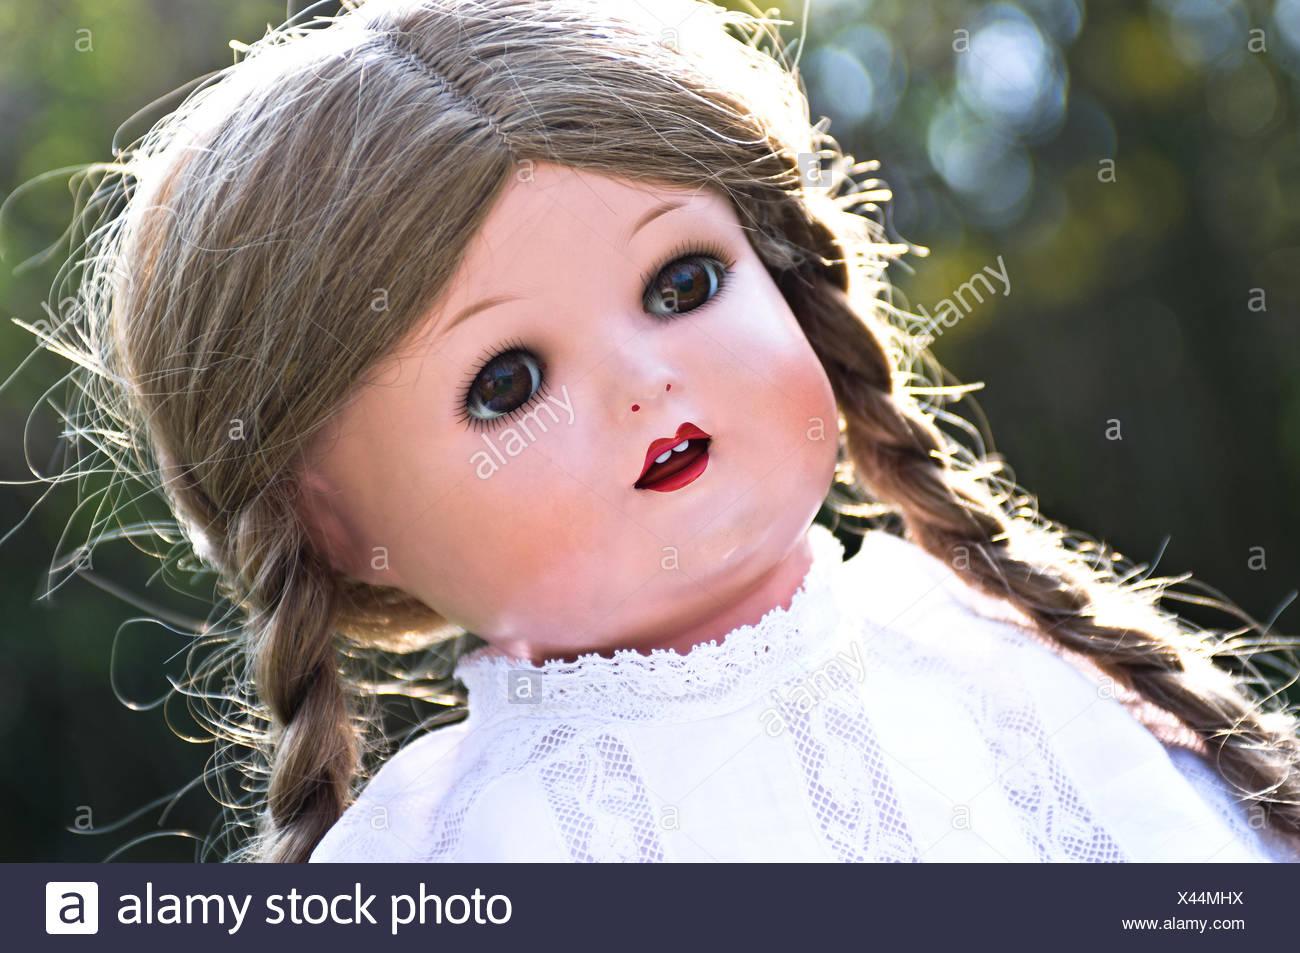 Antique Doll Imágenes De Stock & Antique Doll Fotos De Stock - Alamy